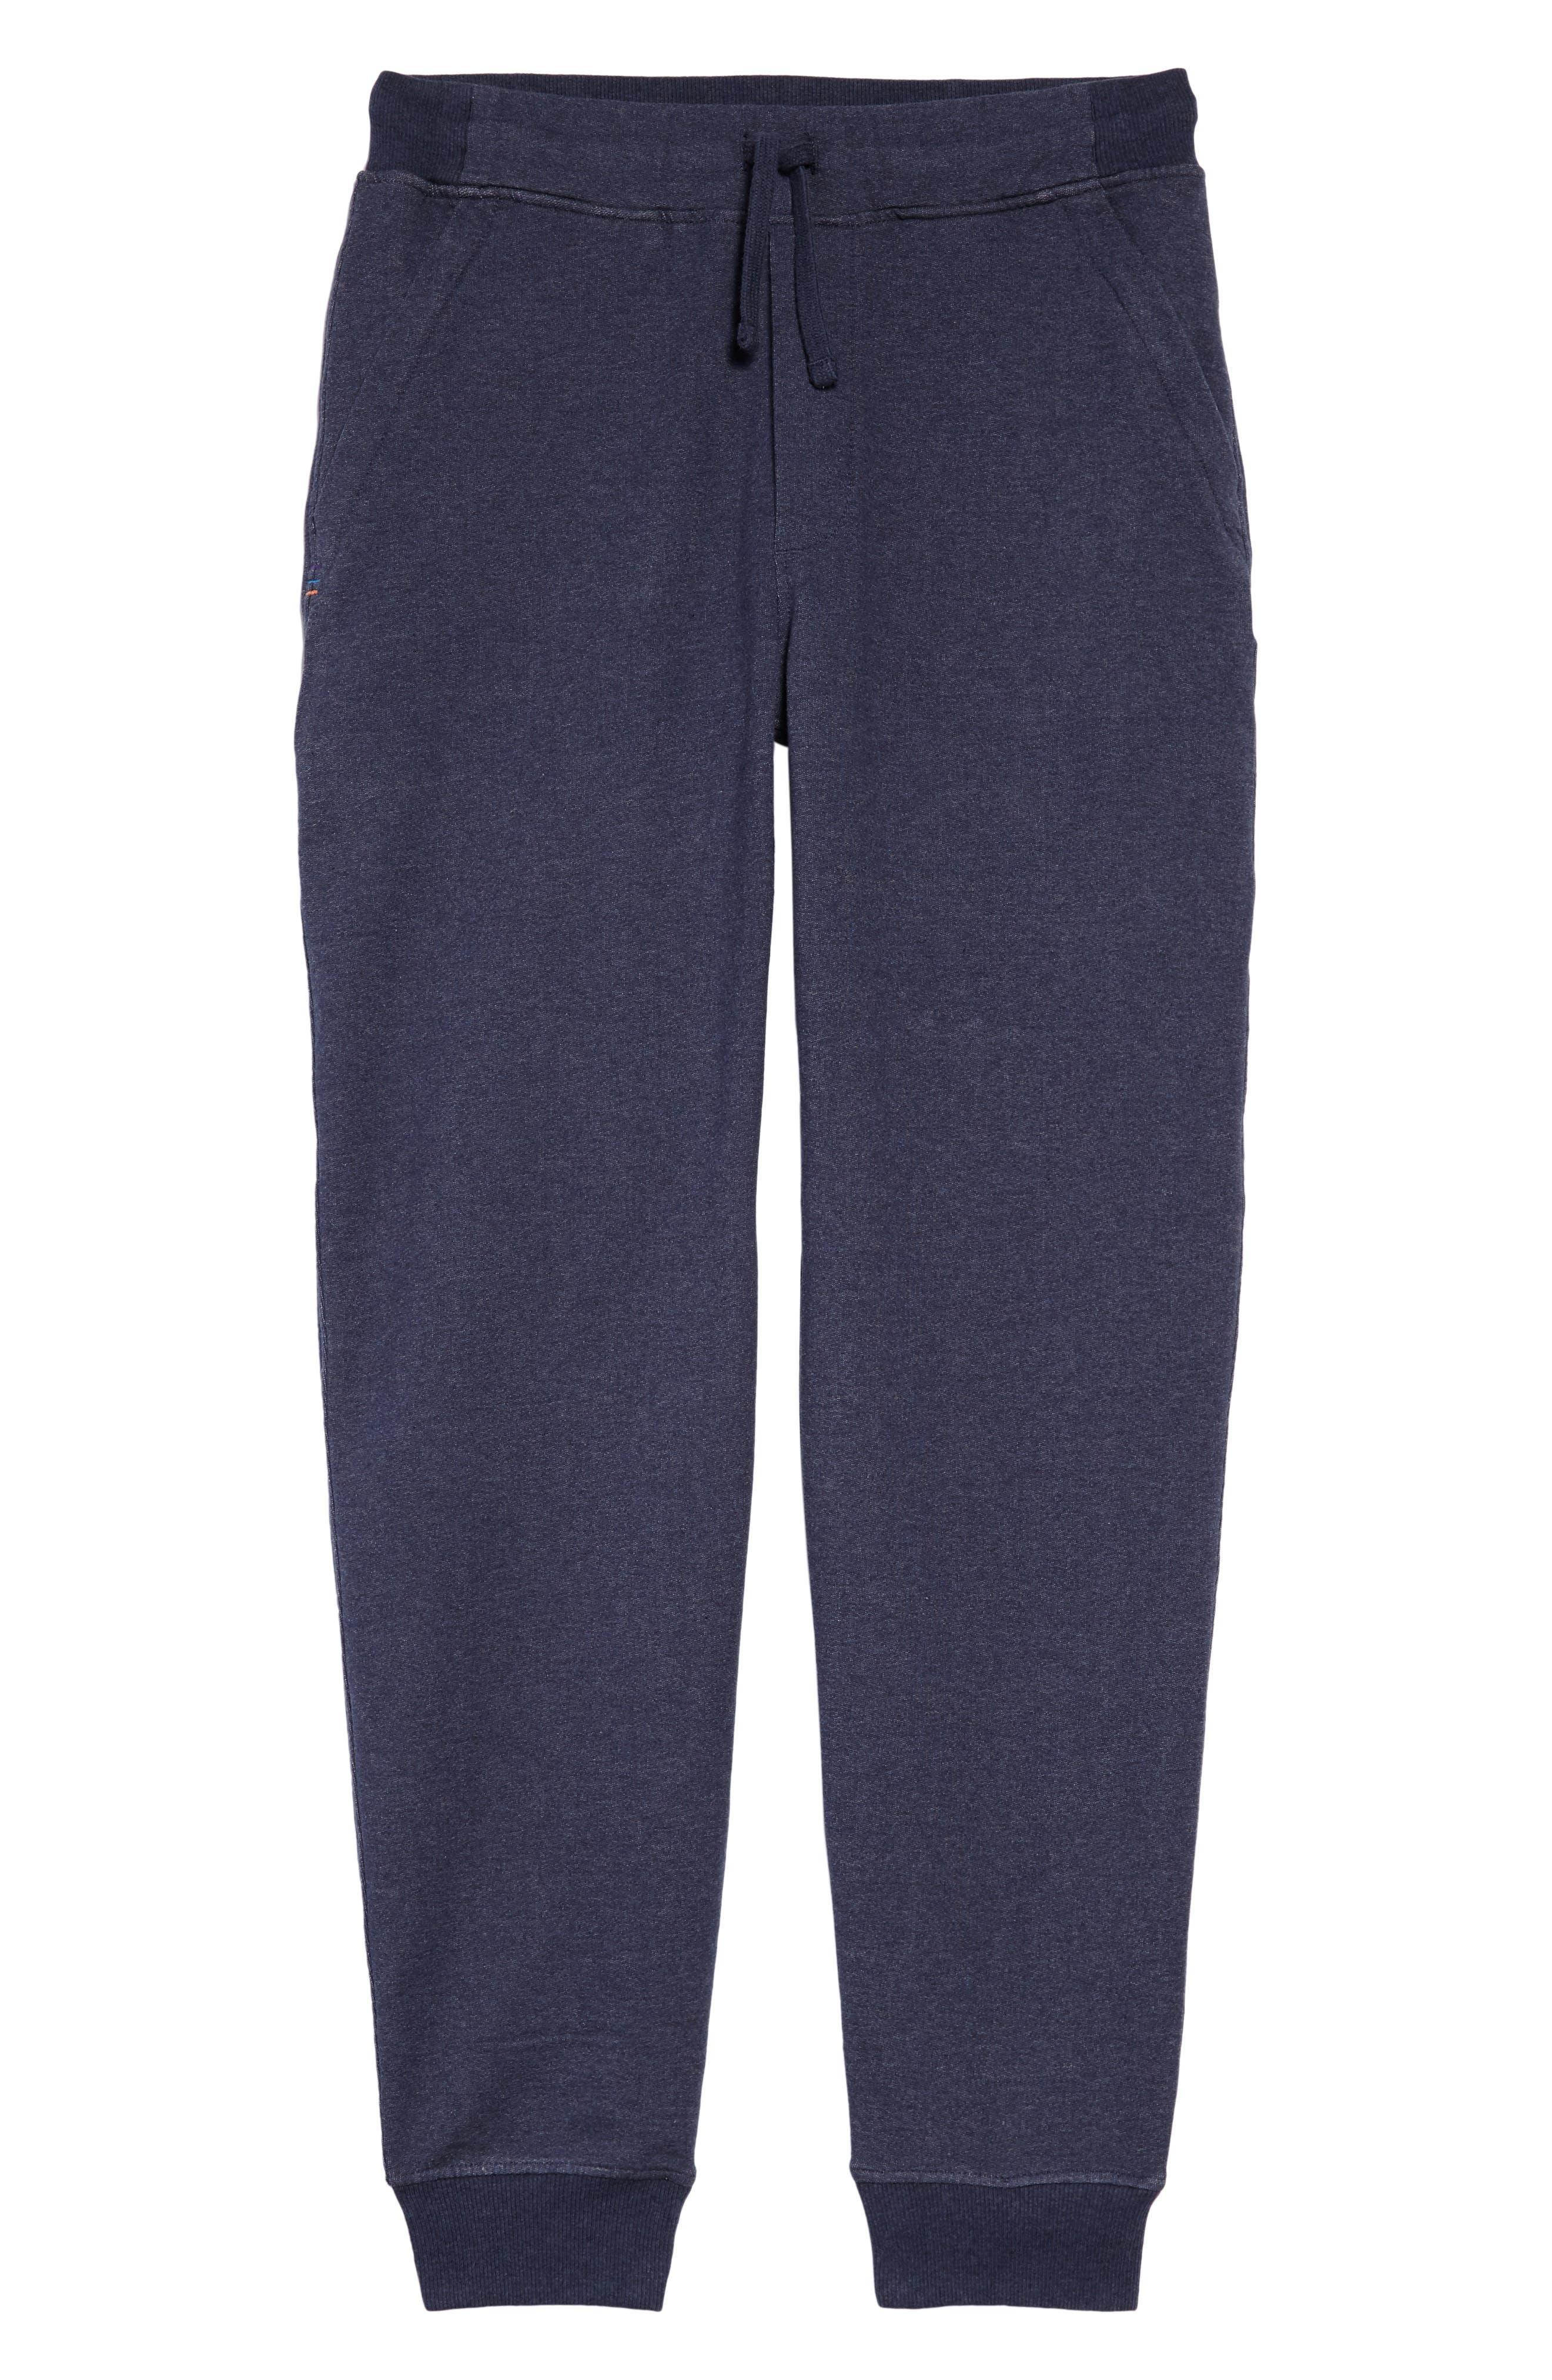 M's Mahnya Fleece Jogger Pants,                             Alternate thumbnail 6, color,                             Navy Blue